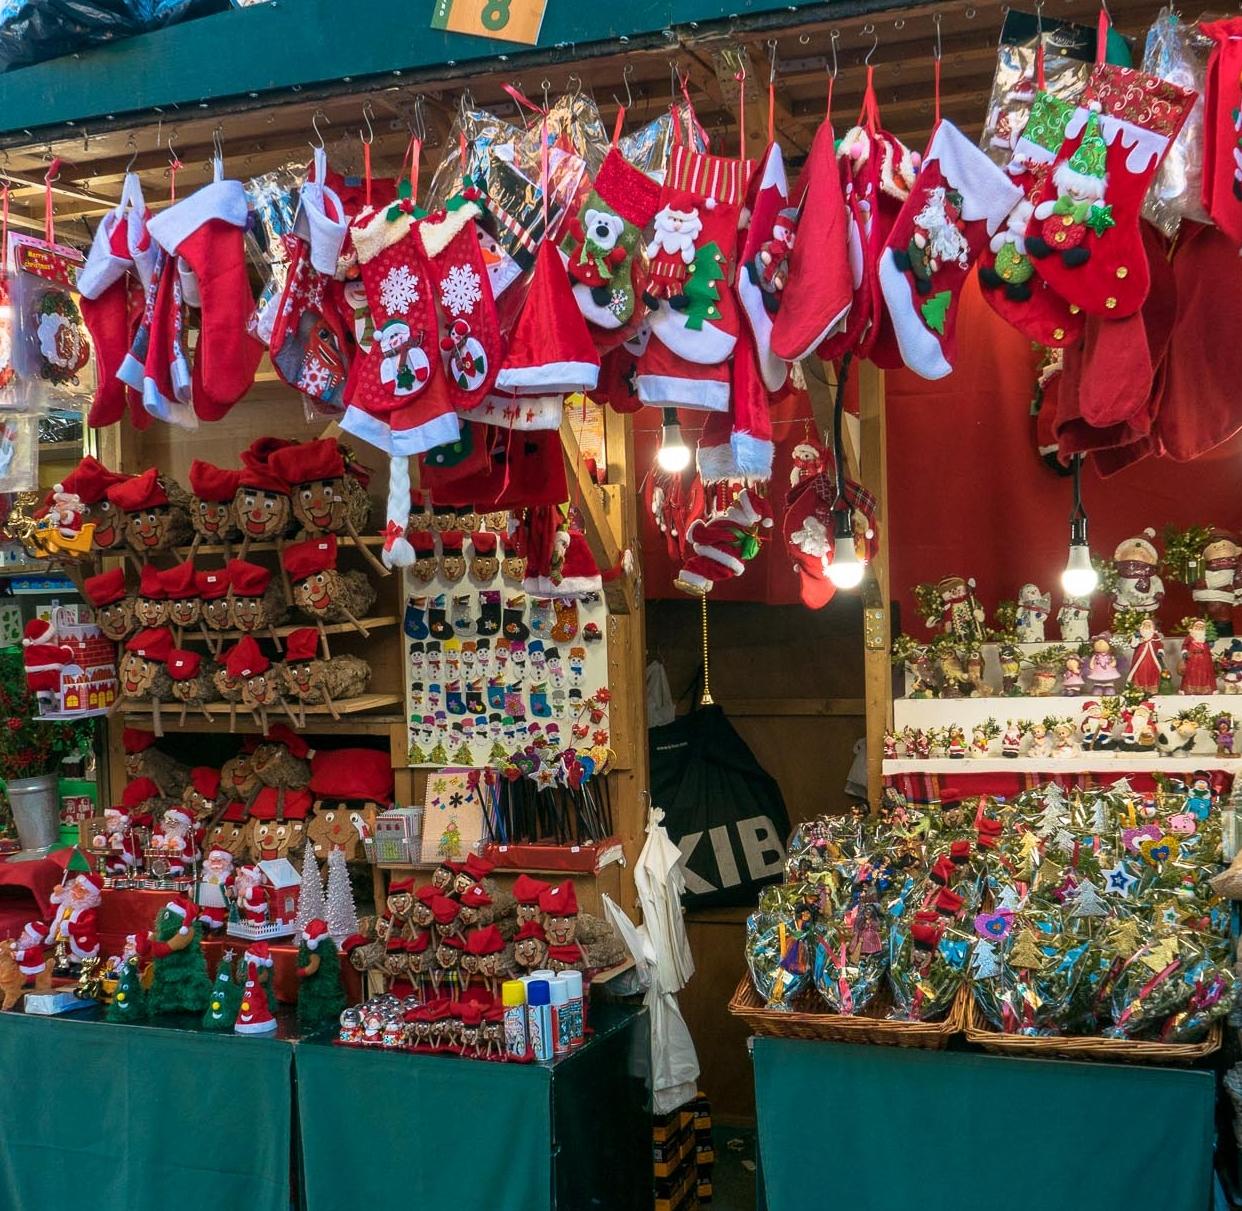 Silly stockings,Santa hats, and mistletoe in the Christmas market,Barcelona, Spain.